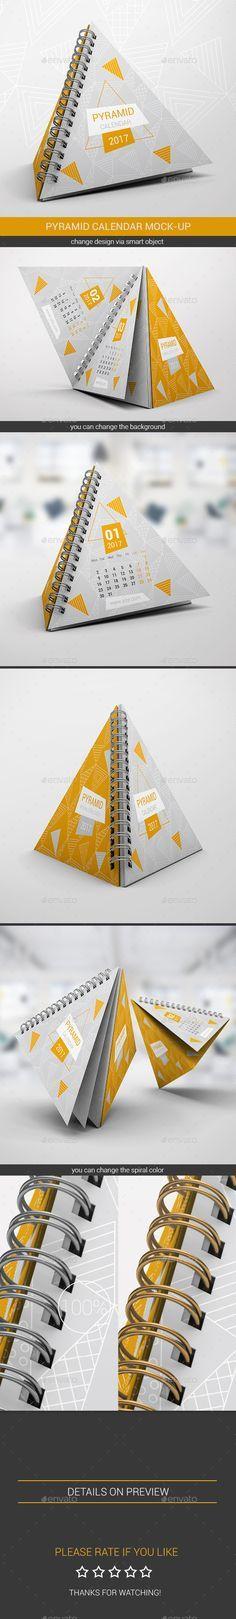 Pyramid Calendar Mock-Up - Miscellaneous Print                                                                                                                                                                                 Mais